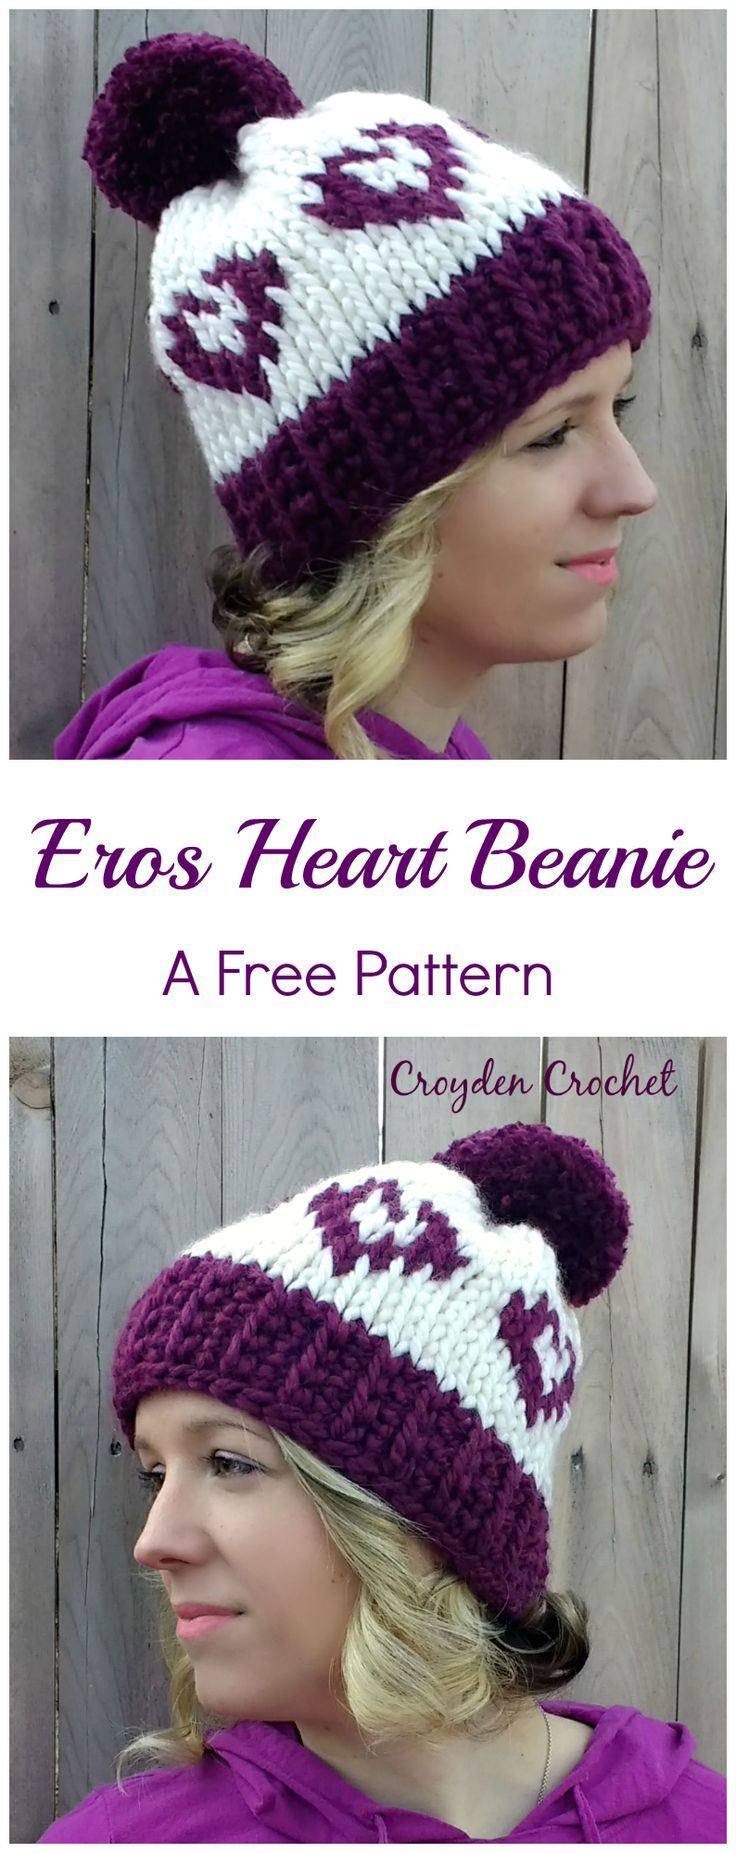 Eros Heart Beanie | Tunisian crochet patterns, Tunisian crochet and ...